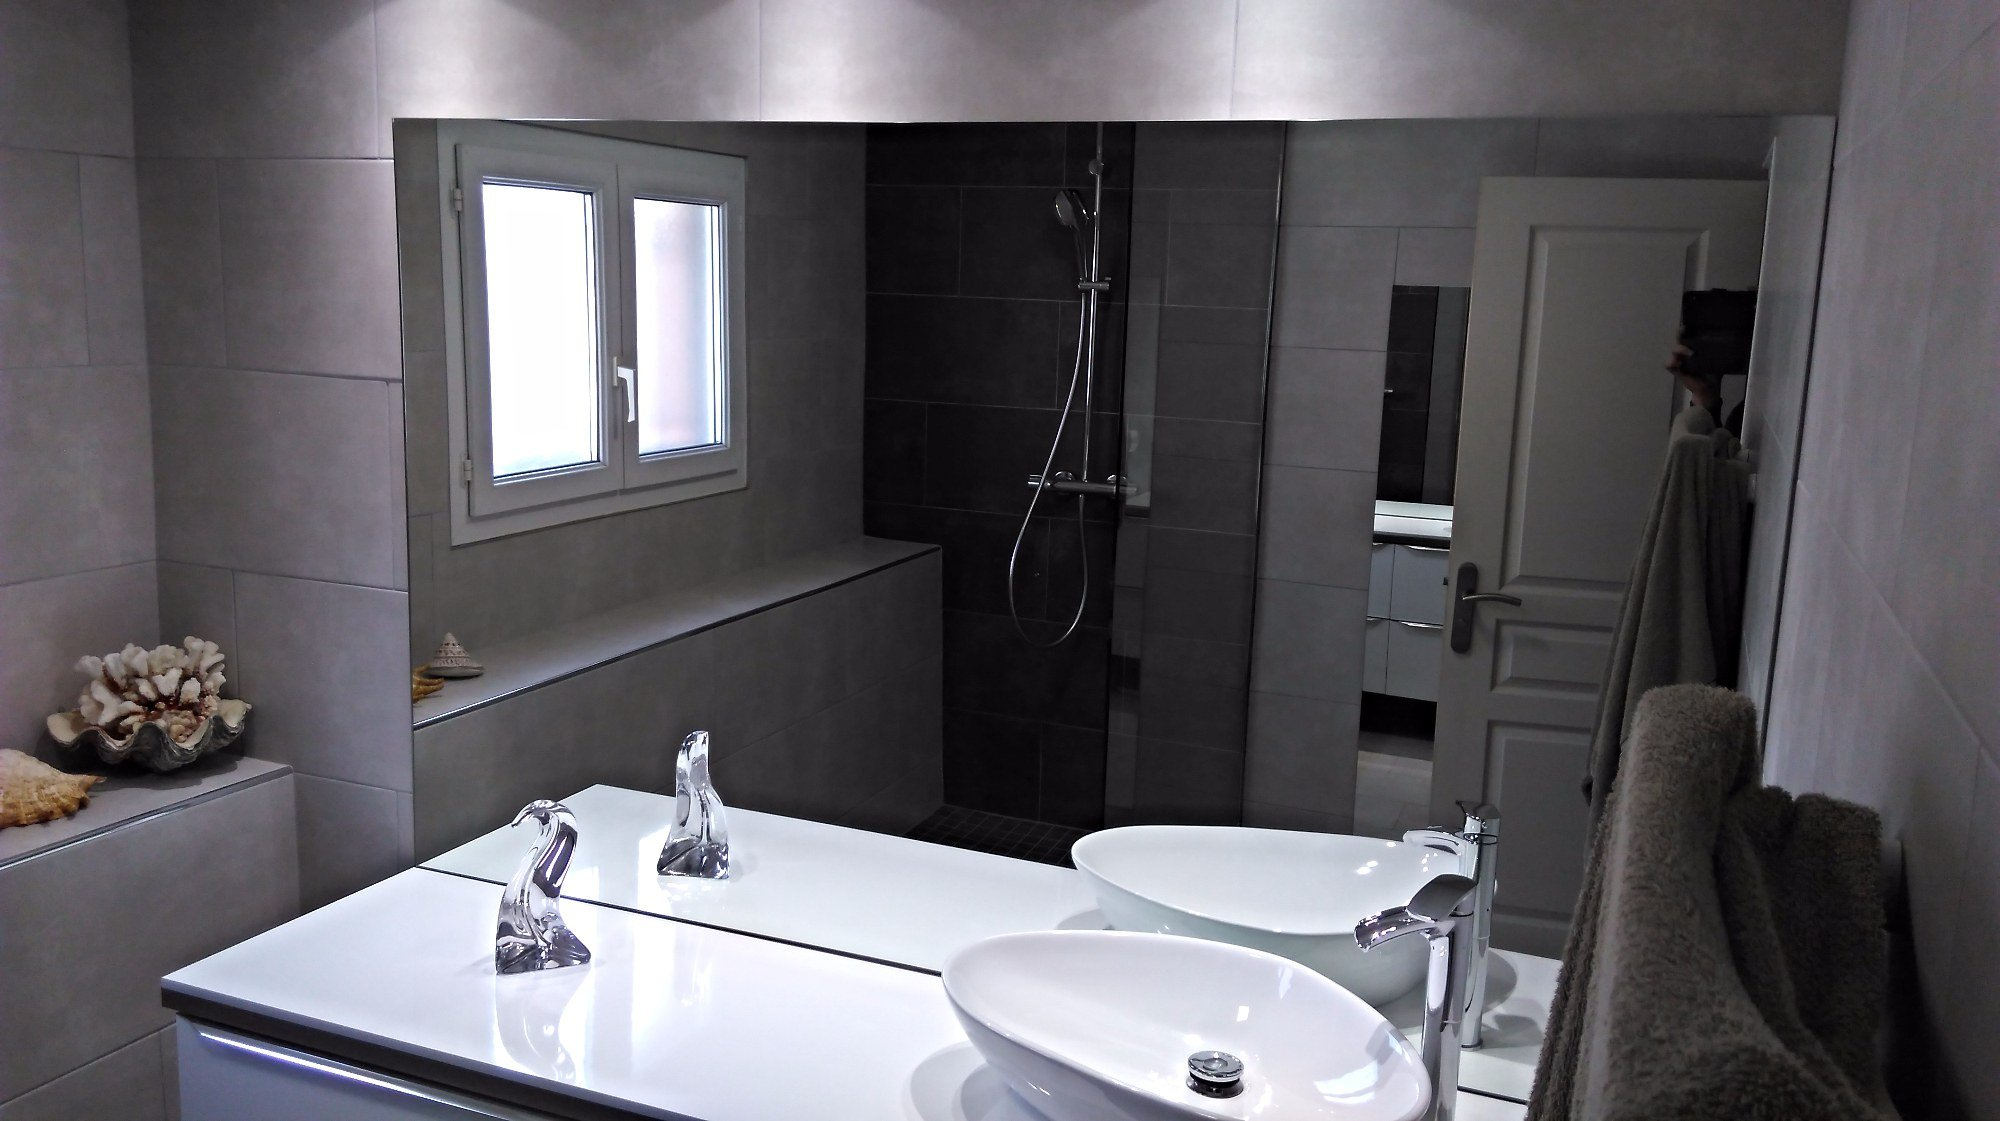 miroir-salle-de-bain-roquevaire